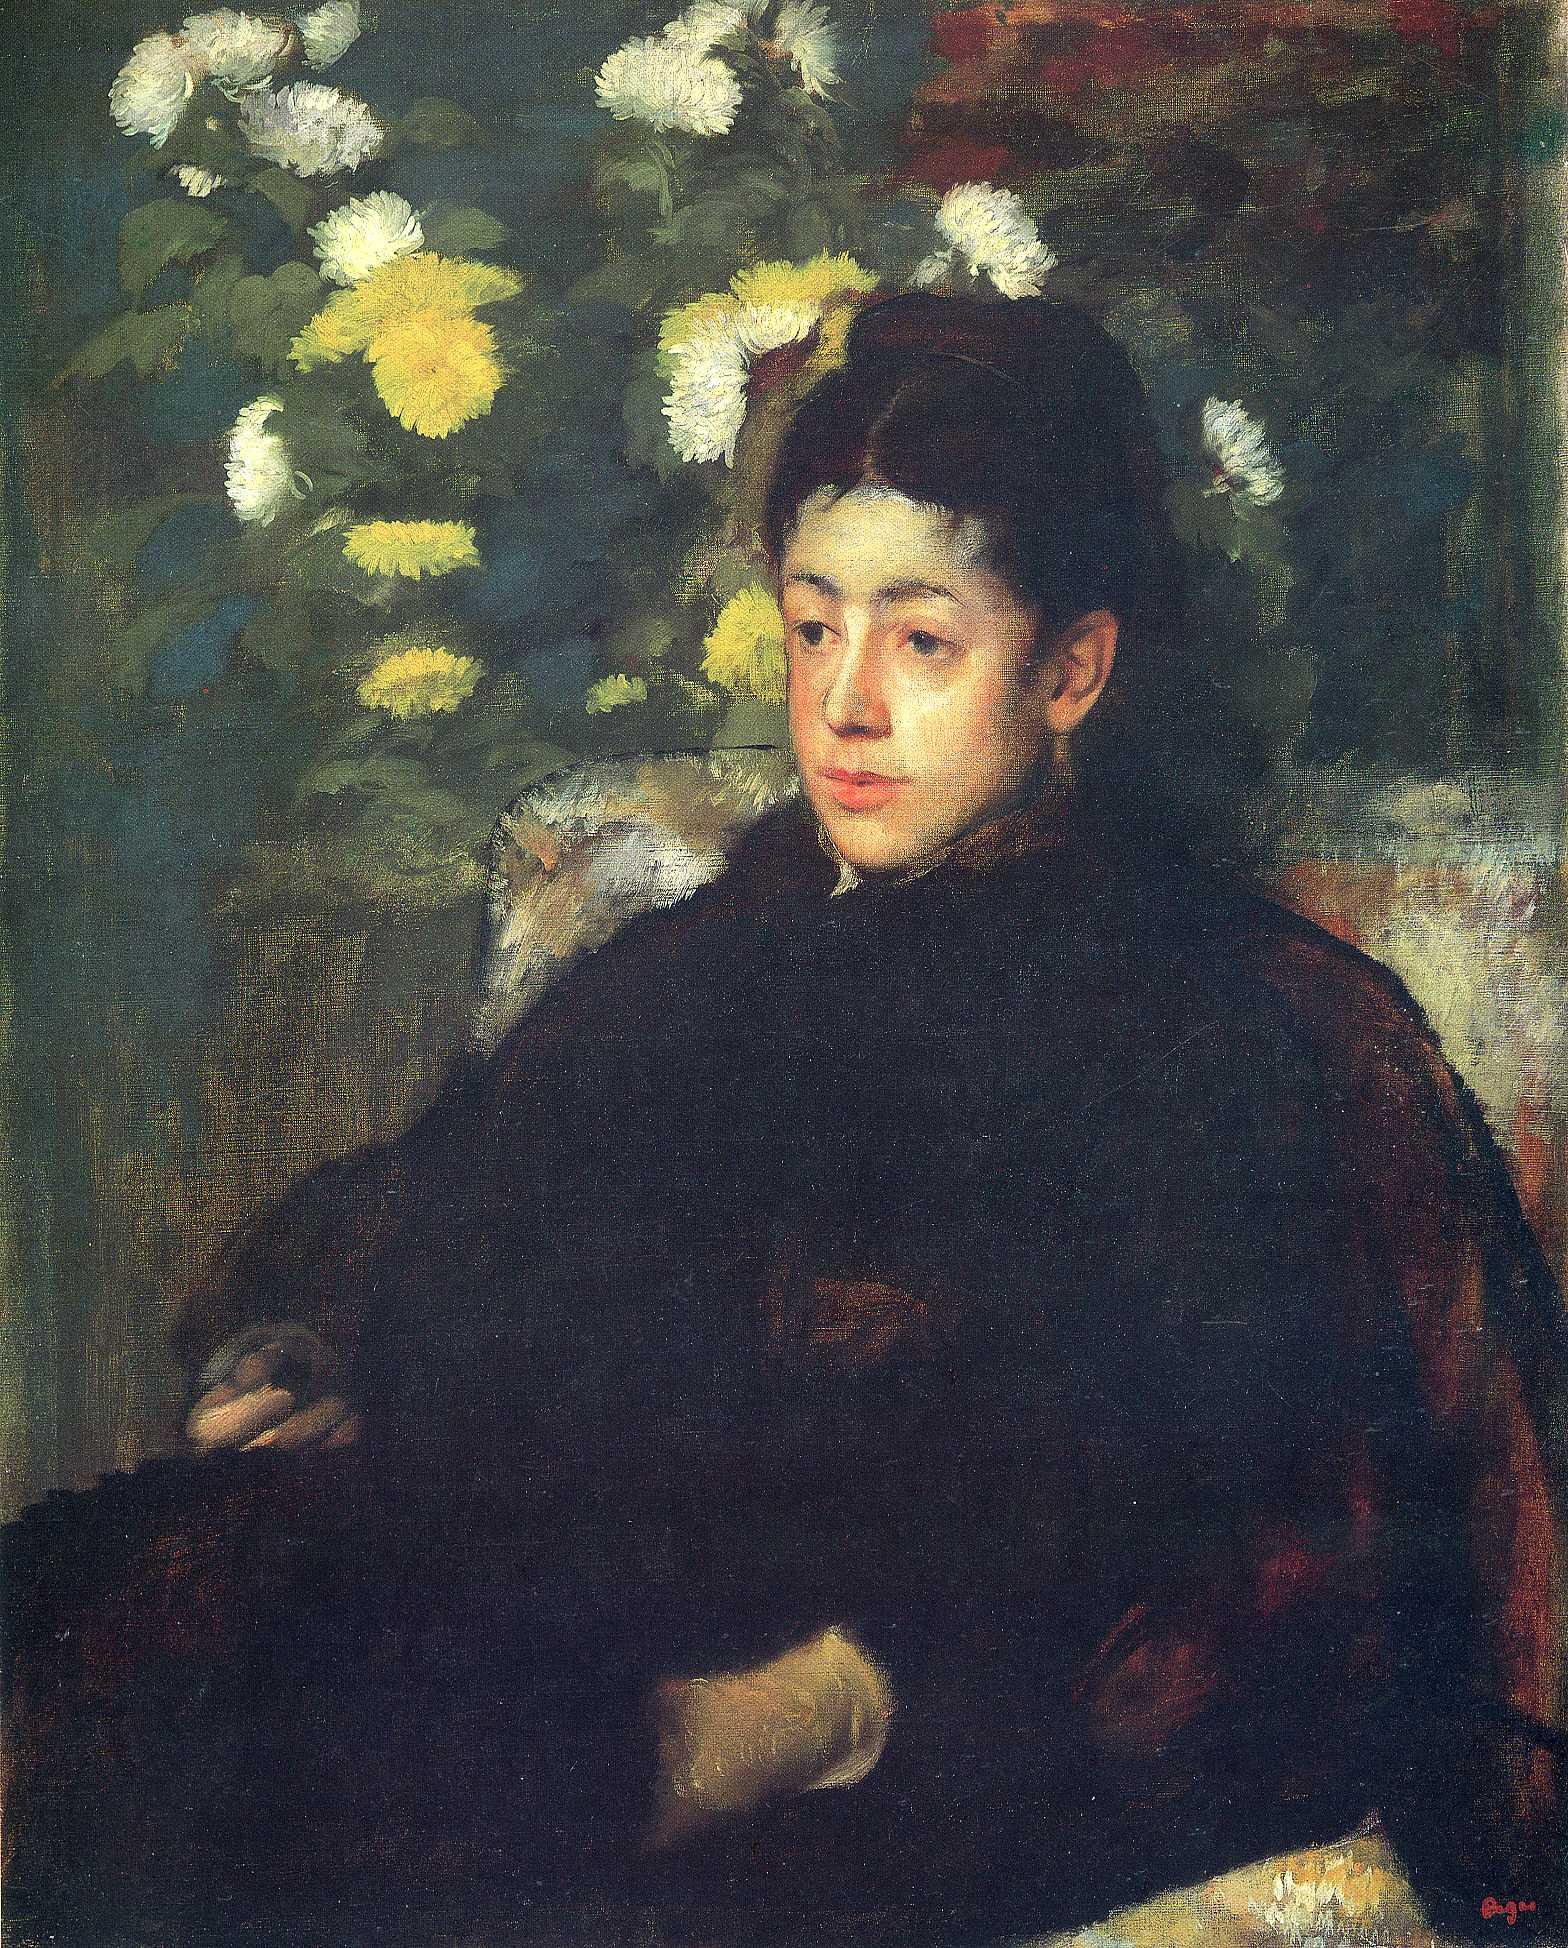 Art History News: Degas/Cassatt at the National Gallery of Art